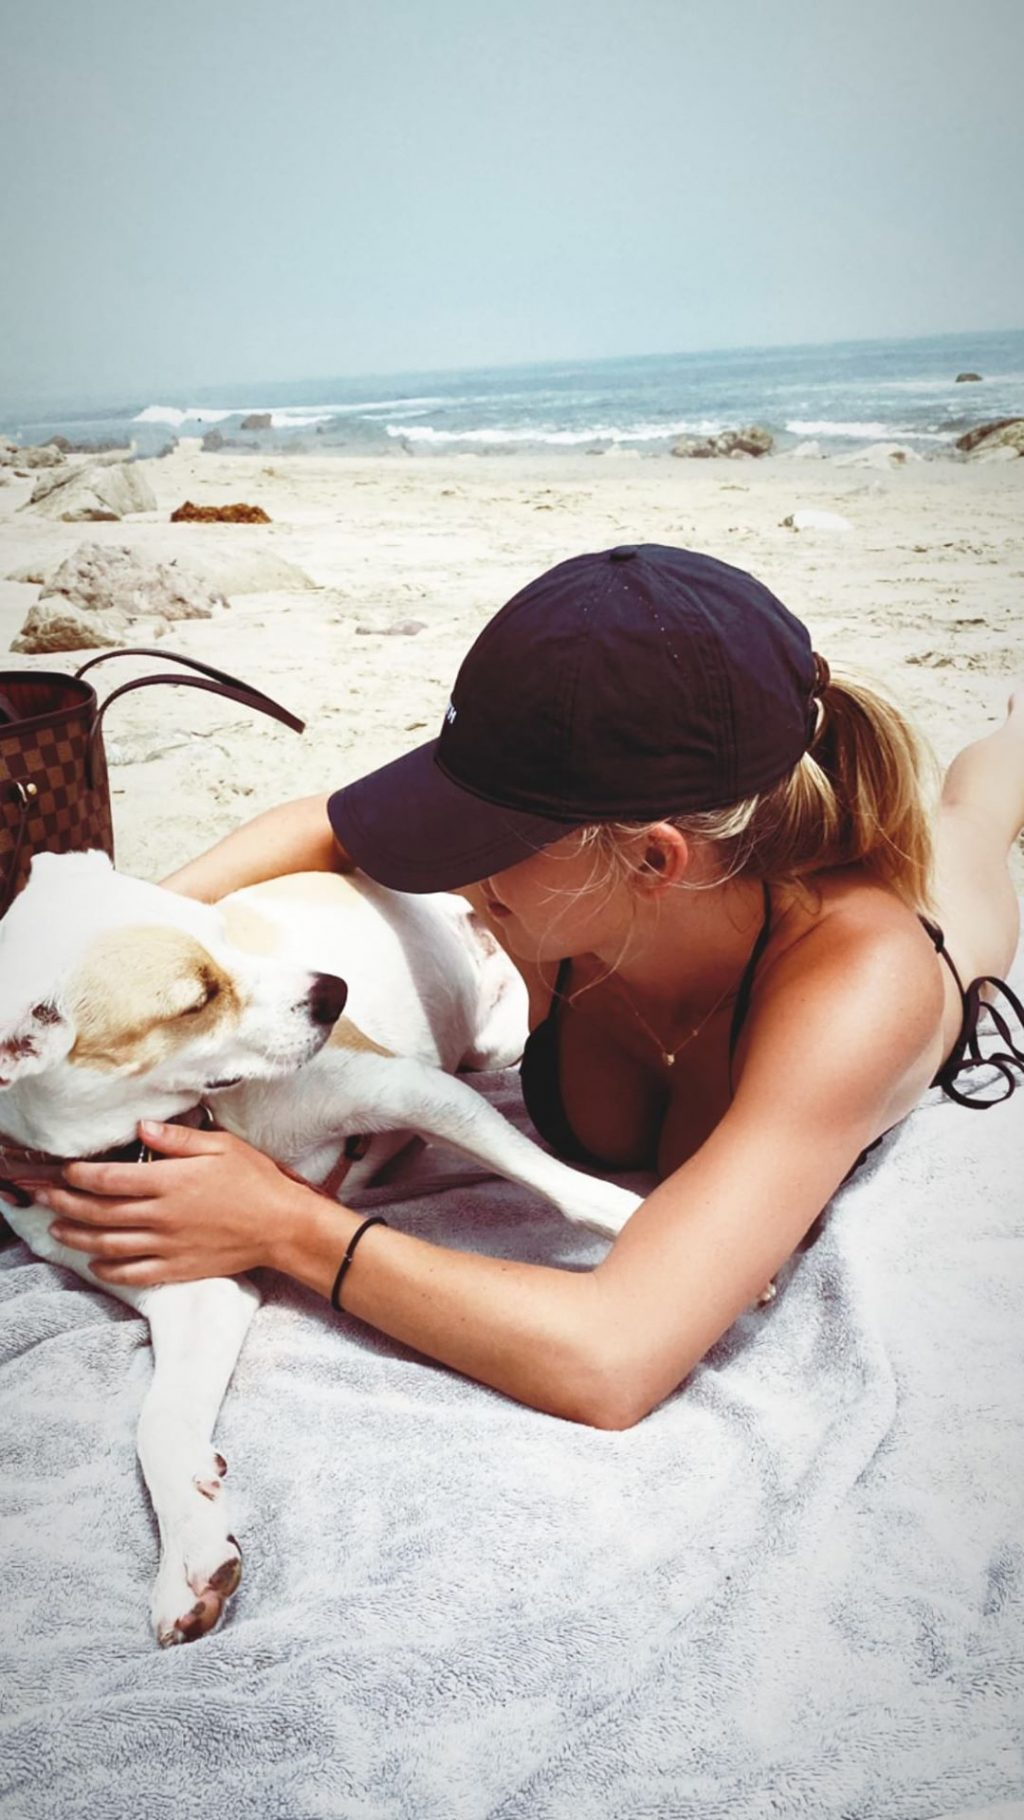 Sydney Sweeney Shows Her Boobs on the Beach (10 Photos + Video)